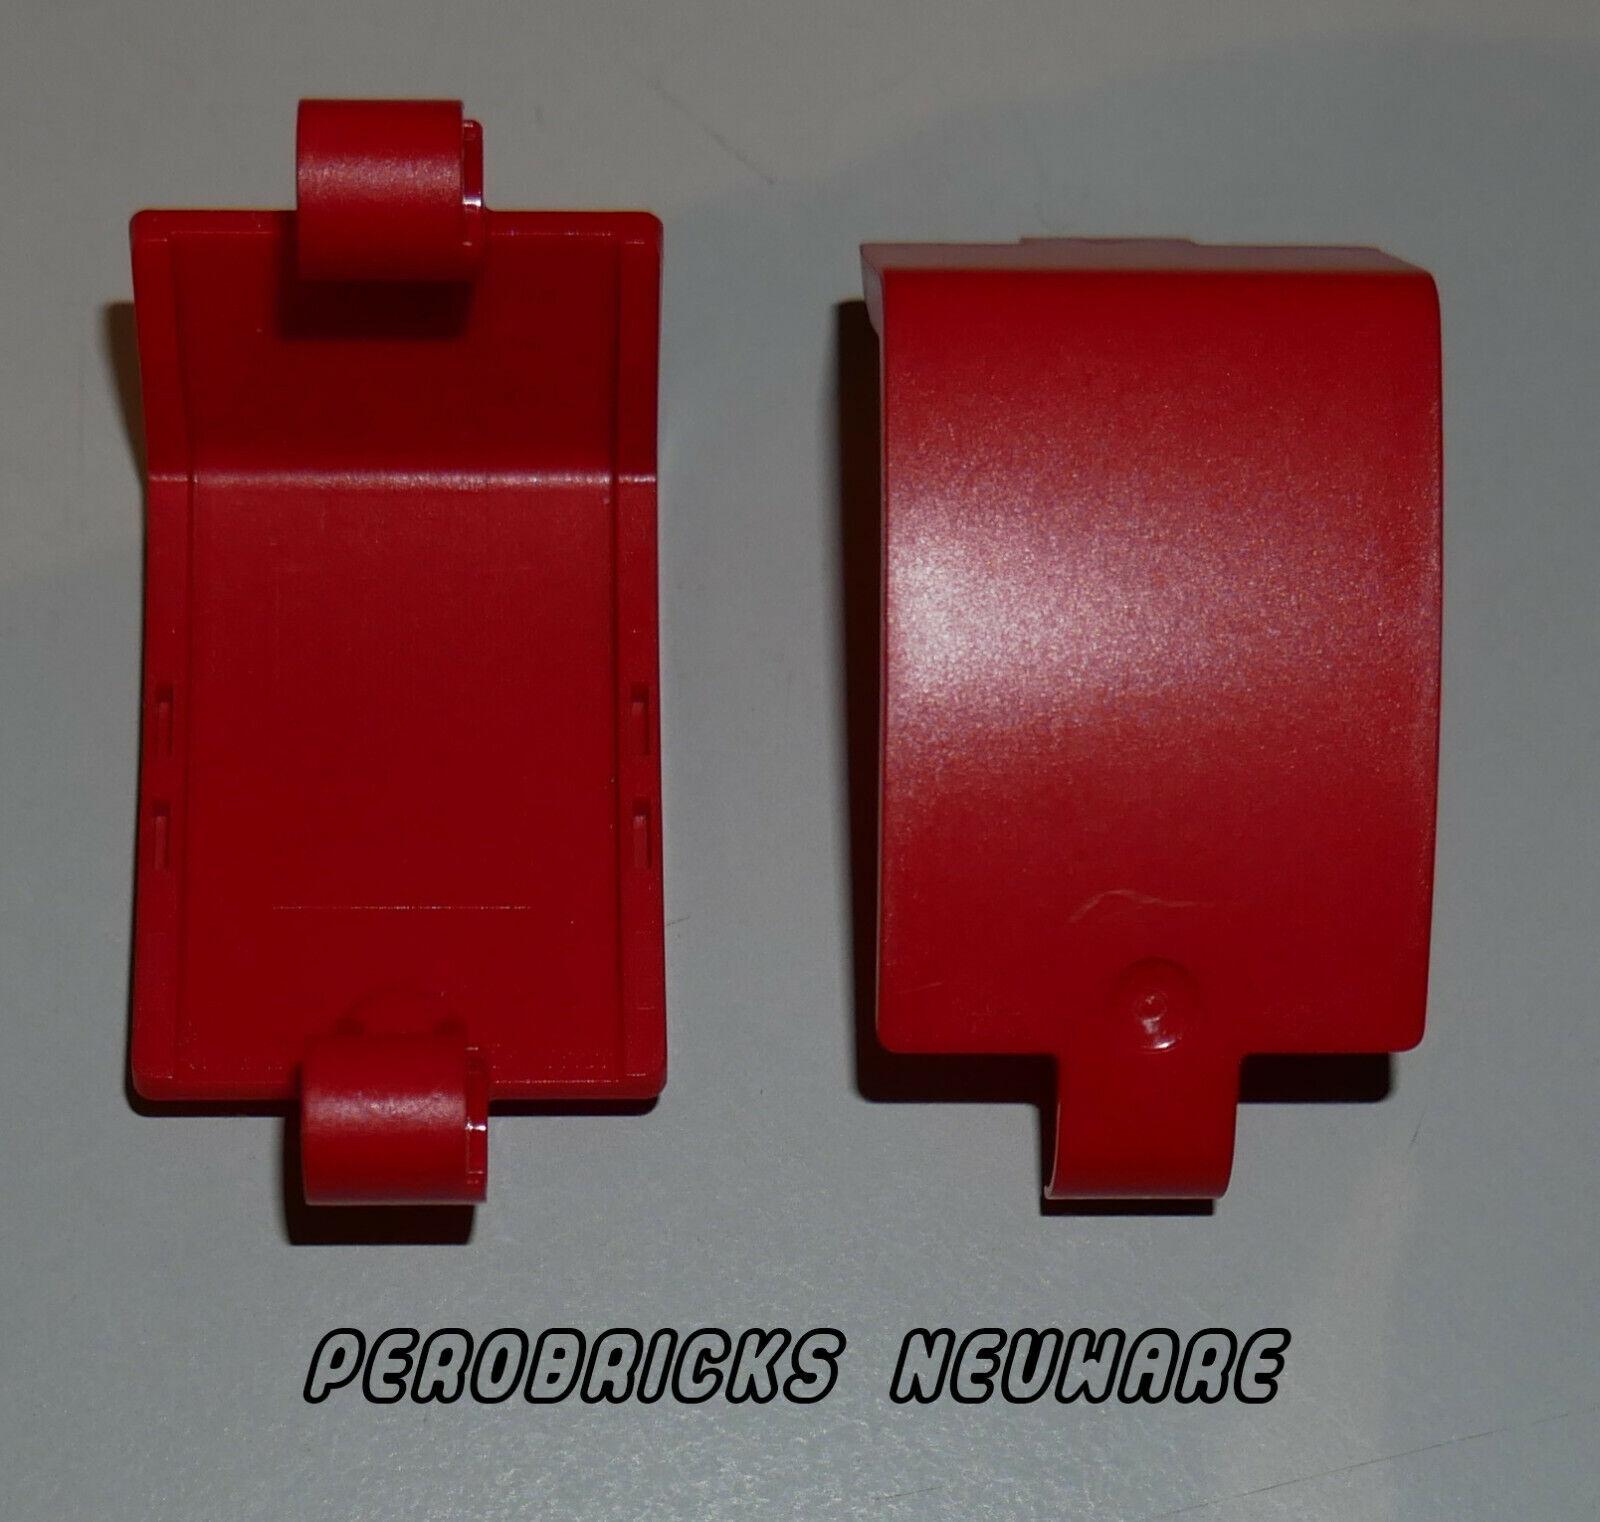 LEGO Technic Technik Paneele Panele Flügel Verkleidung Set 1 2 3 4 5 6 17 18 rot